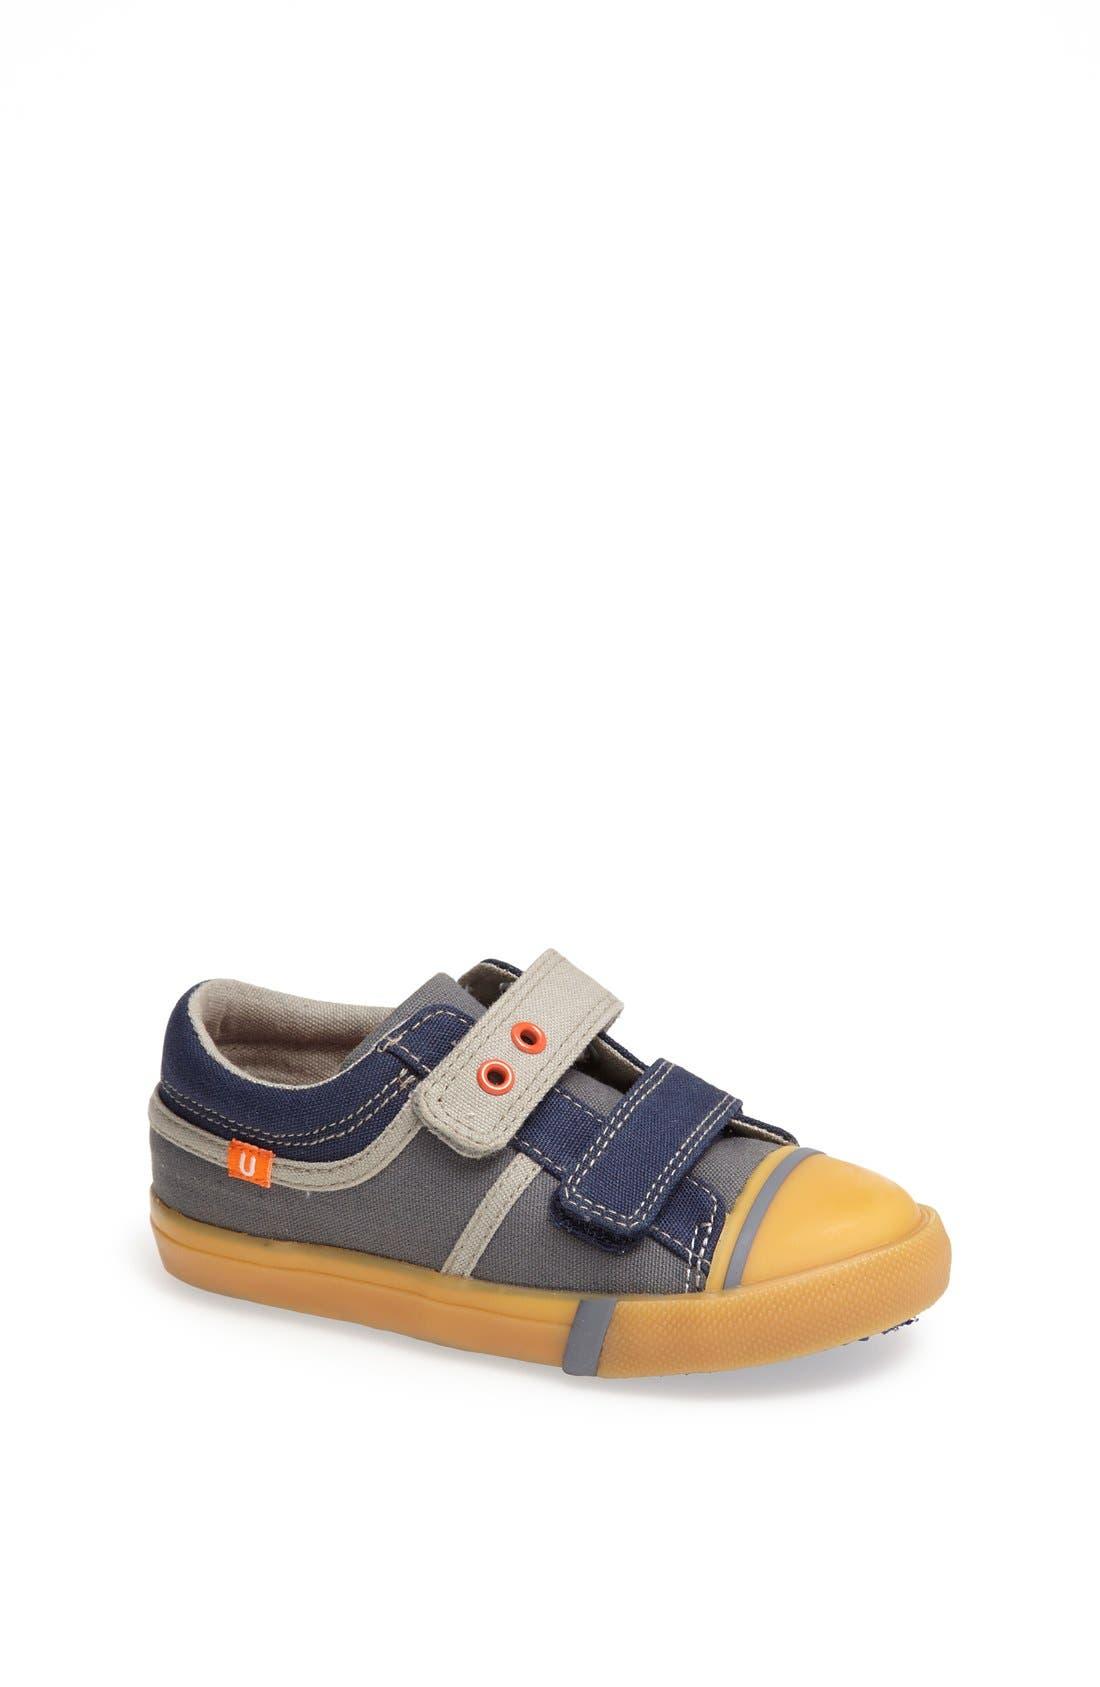 Main Image - Umi 'Mack' Sneaker (Toddler, Little Kid & Big Kid)